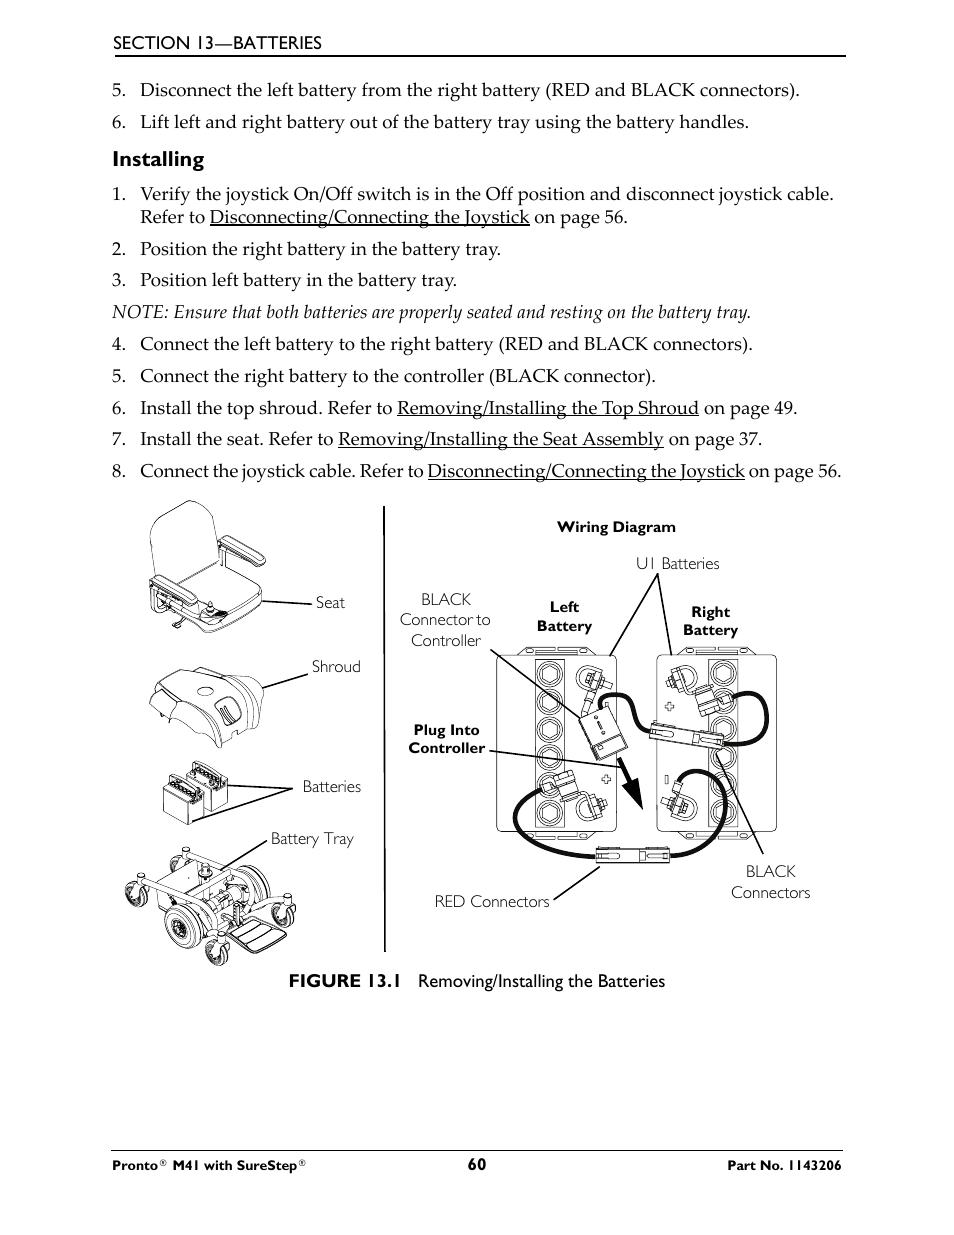 Installing   Activeforever Invacare Pronto M41 Power ... on electronic circuit diagrams, switch diagrams, engine diagrams, sincgars radio configurations diagrams, transformer diagrams, honda motorcycle repair diagrams, lighting diagrams, electrical diagrams, friendship bracelet diagrams, troubleshooting diagrams, hvac diagrams, internet of things diagrams, series and parallel circuits diagrams, motor diagrams, battery diagrams, smart car diagrams, gmc fuse box diagrams, pinout diagrams, led circuit diagrams,